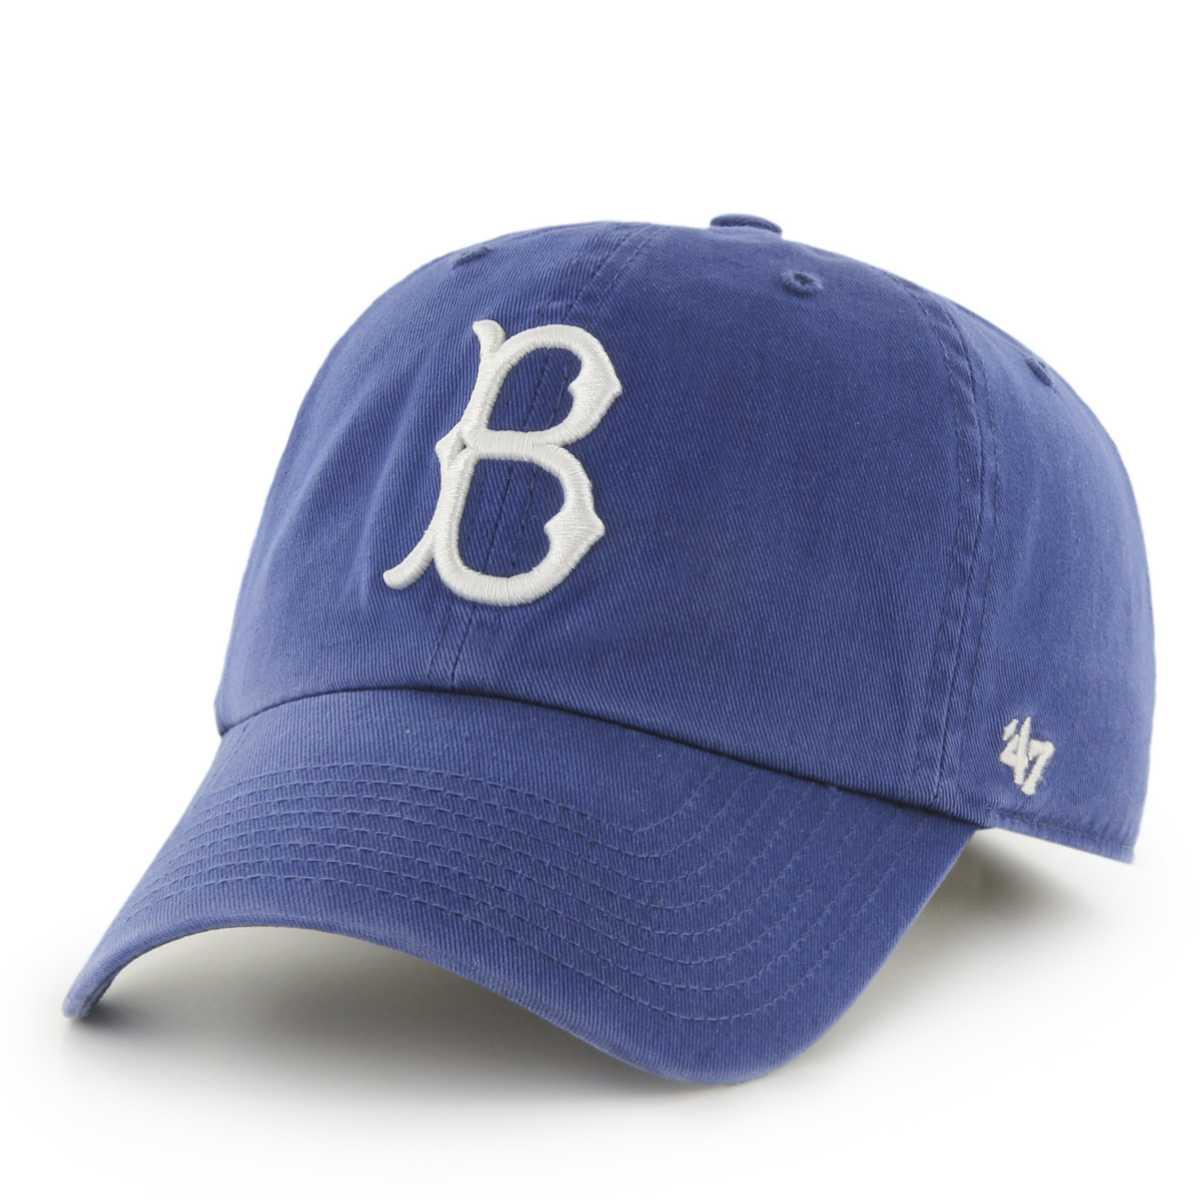 brooklyn dodgers  brand blue clean  slouch adjustable strap hat cap ebay